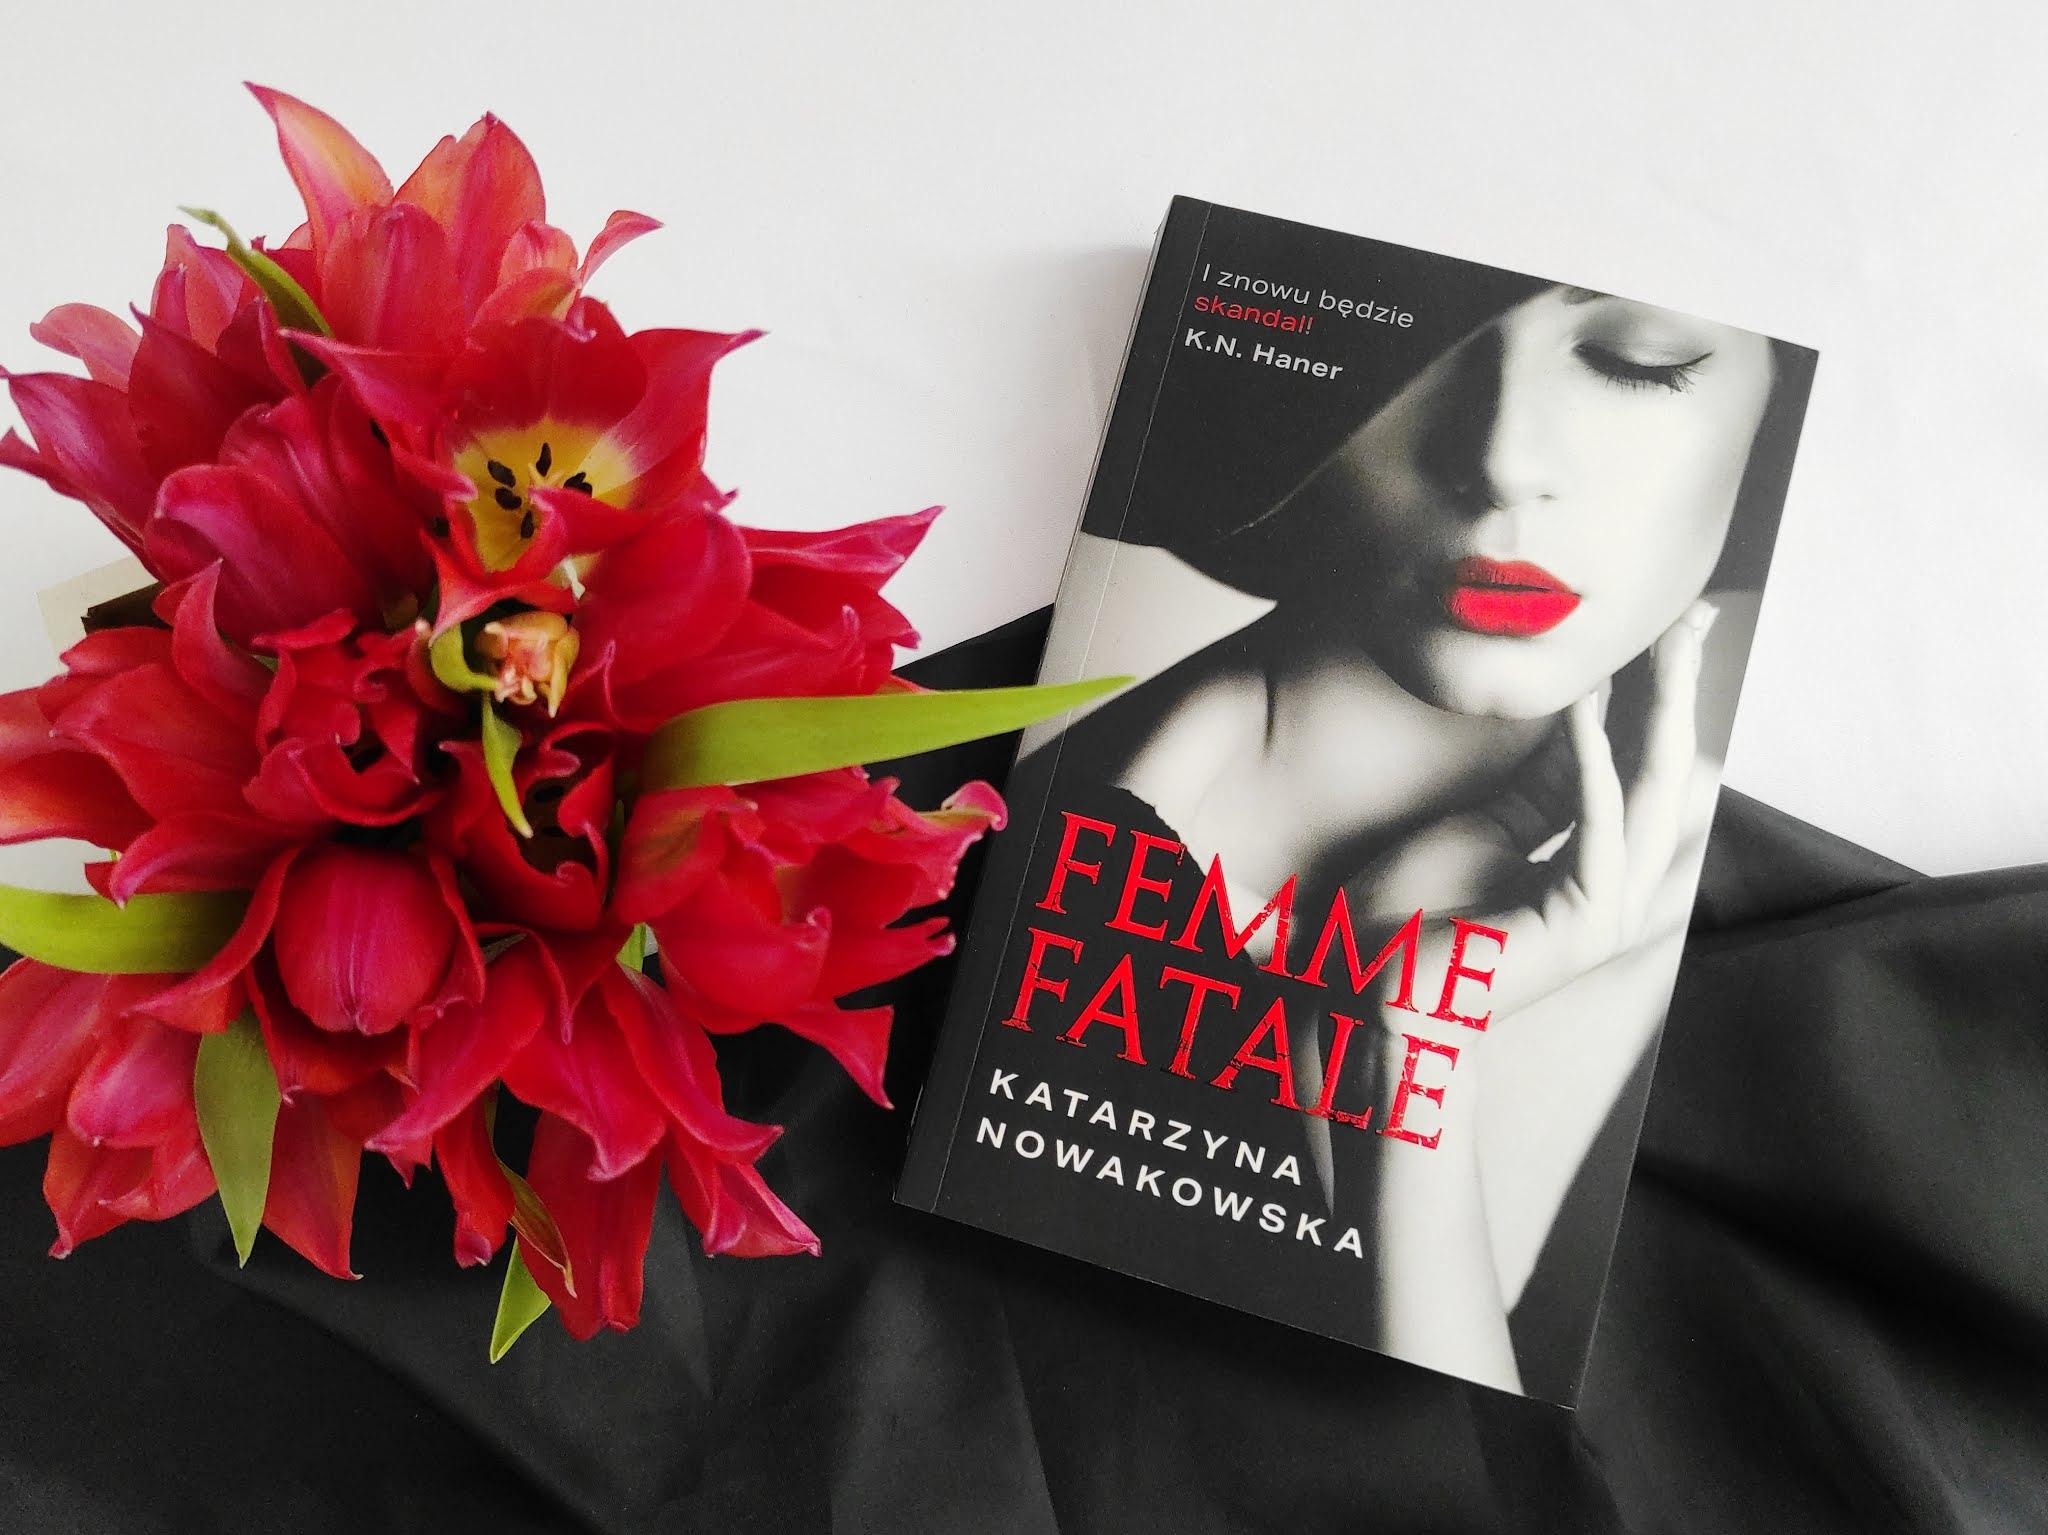 """Femme Fatale"", Katarzyna Nowakowska"